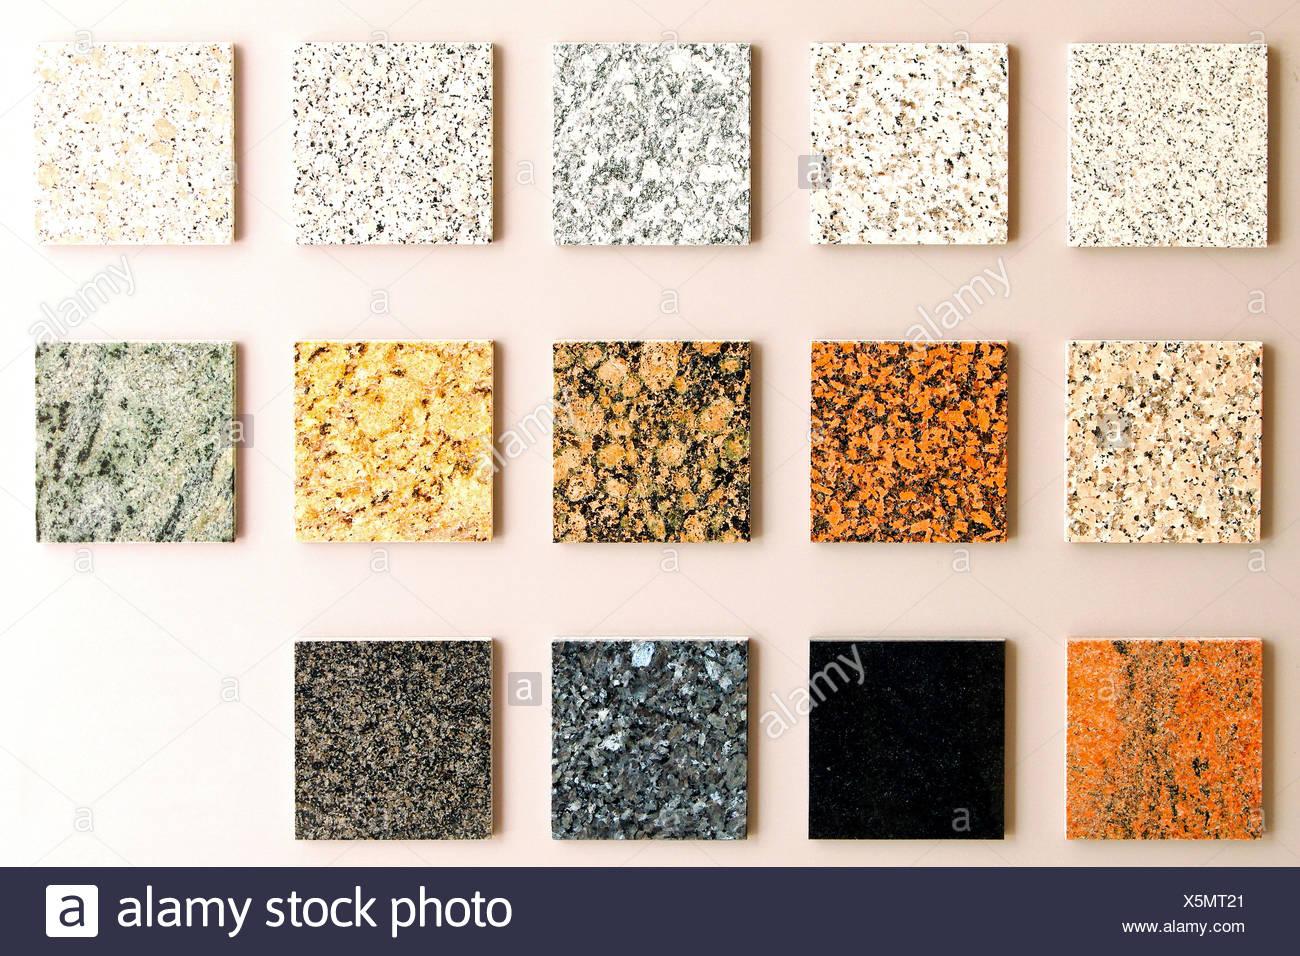 https www alamy com marble samples image278897081 html